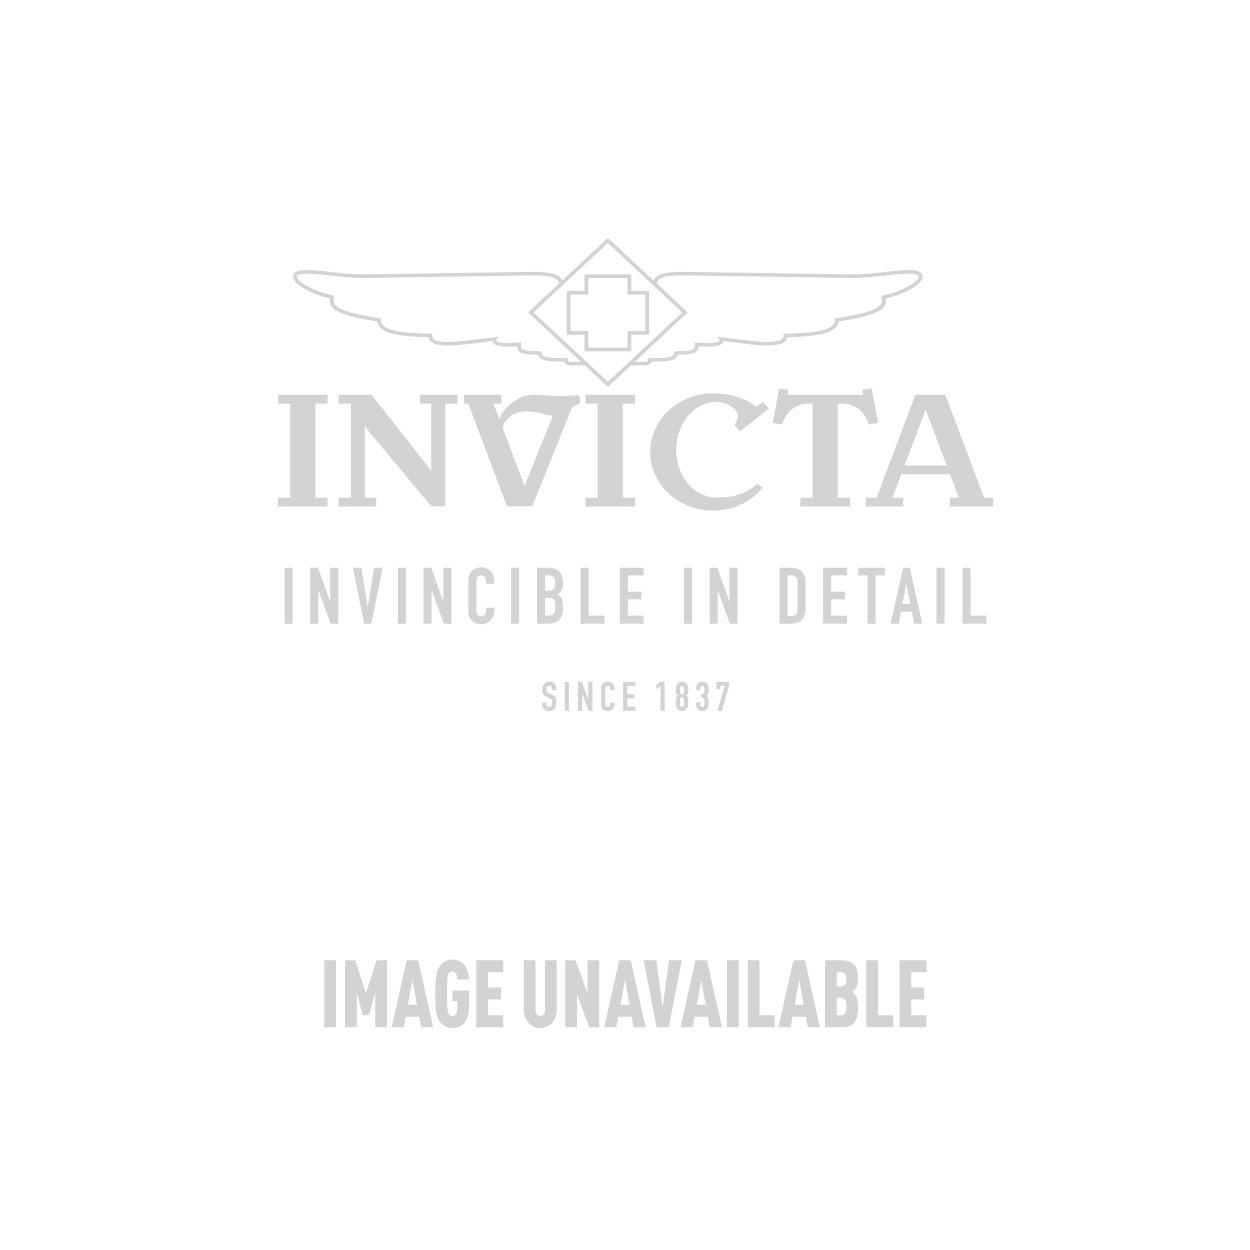 INVICTA Jewelry ALOYSIUS Bracelets 23 18.7 Silver 925 and Ceramic White+Platinum - Model J0116